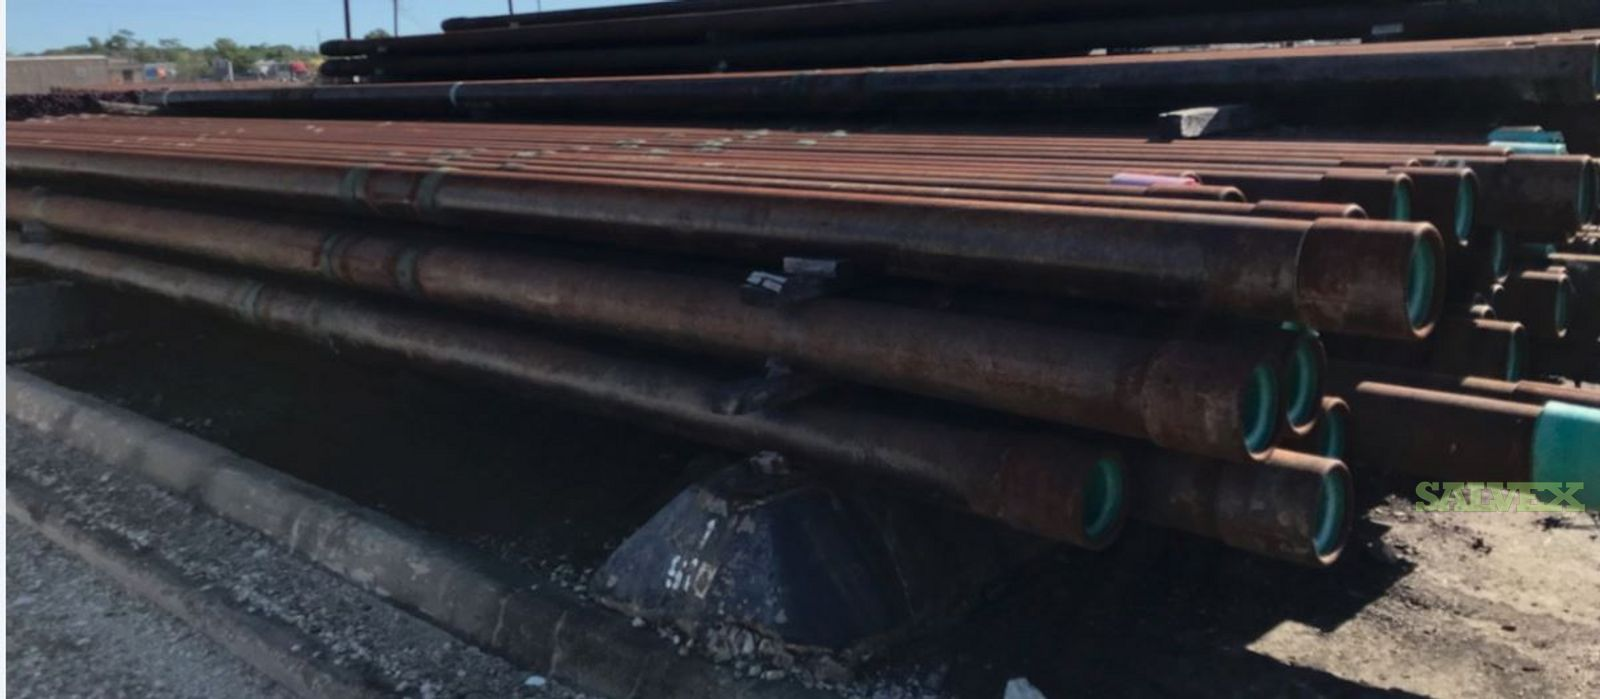 7 5/8 - 7/3/4 Q125 HC TSH  R3 Reject Casing & PUP JNT (3,607 Feet / 75 Metric Tons)